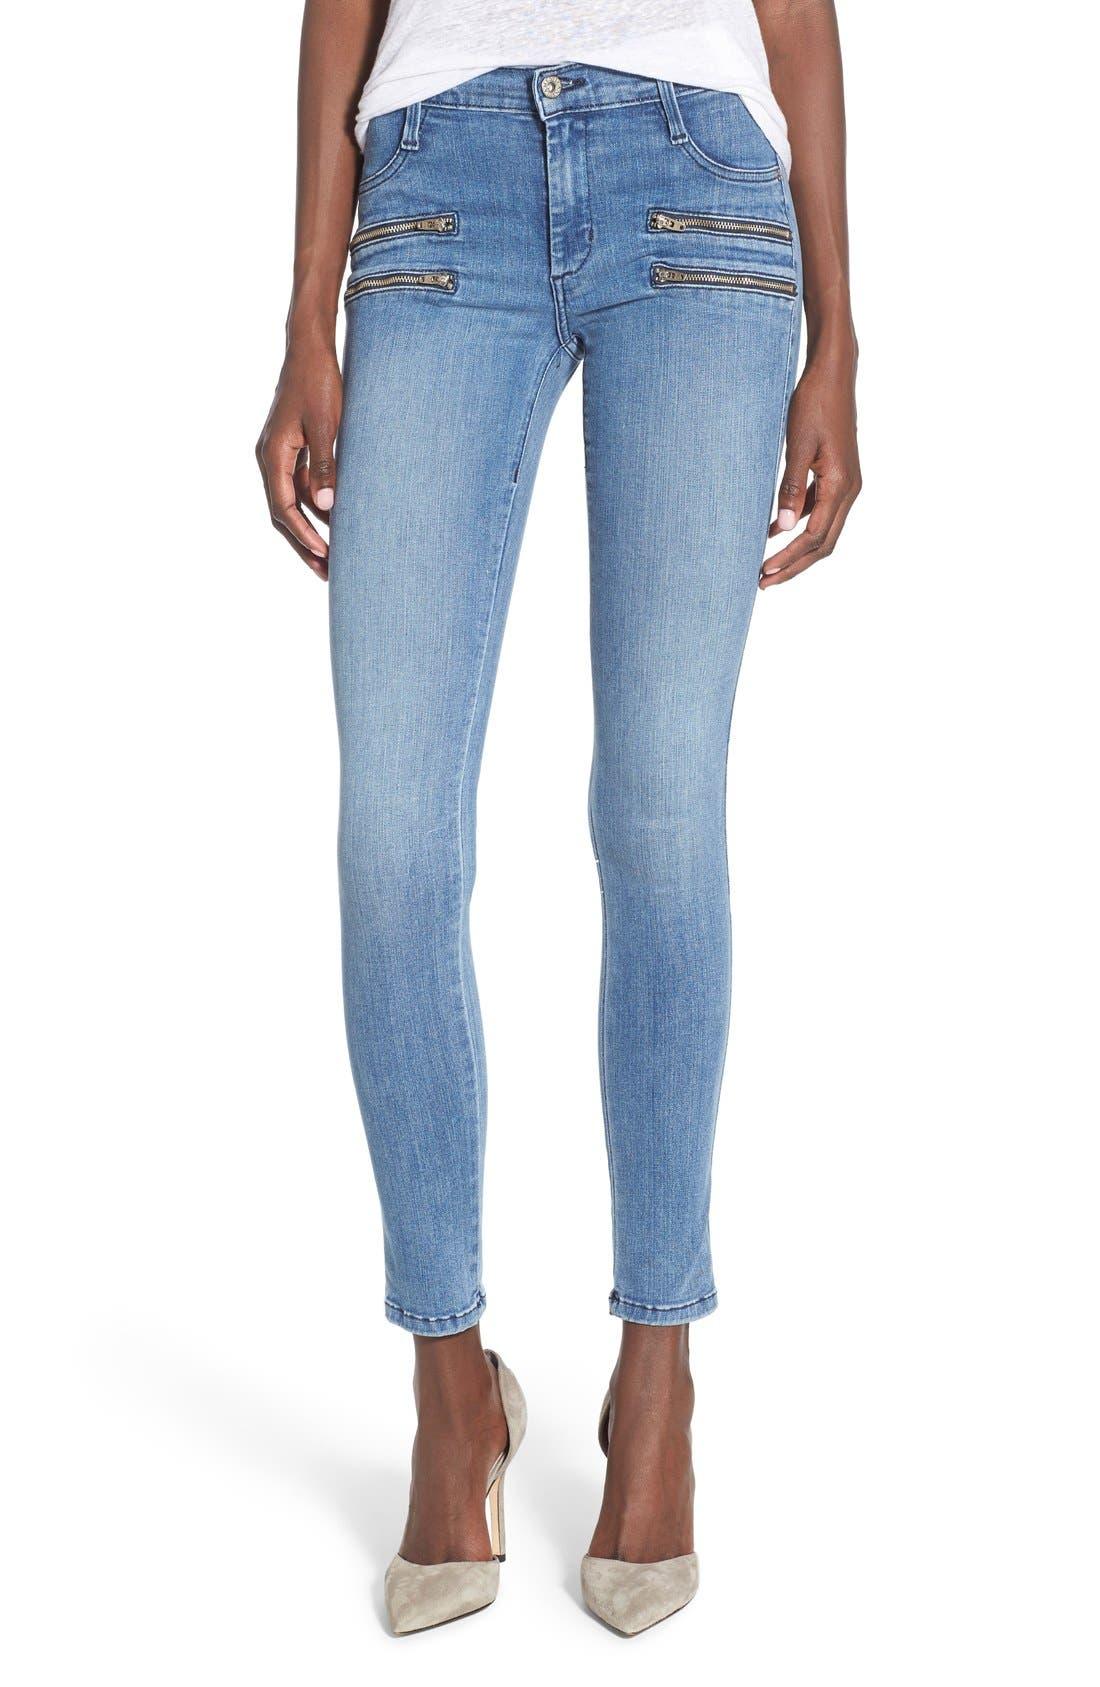 Alternate Image 1 Selected - James Jeans Double Front Zip Denim Leggings (Splash)